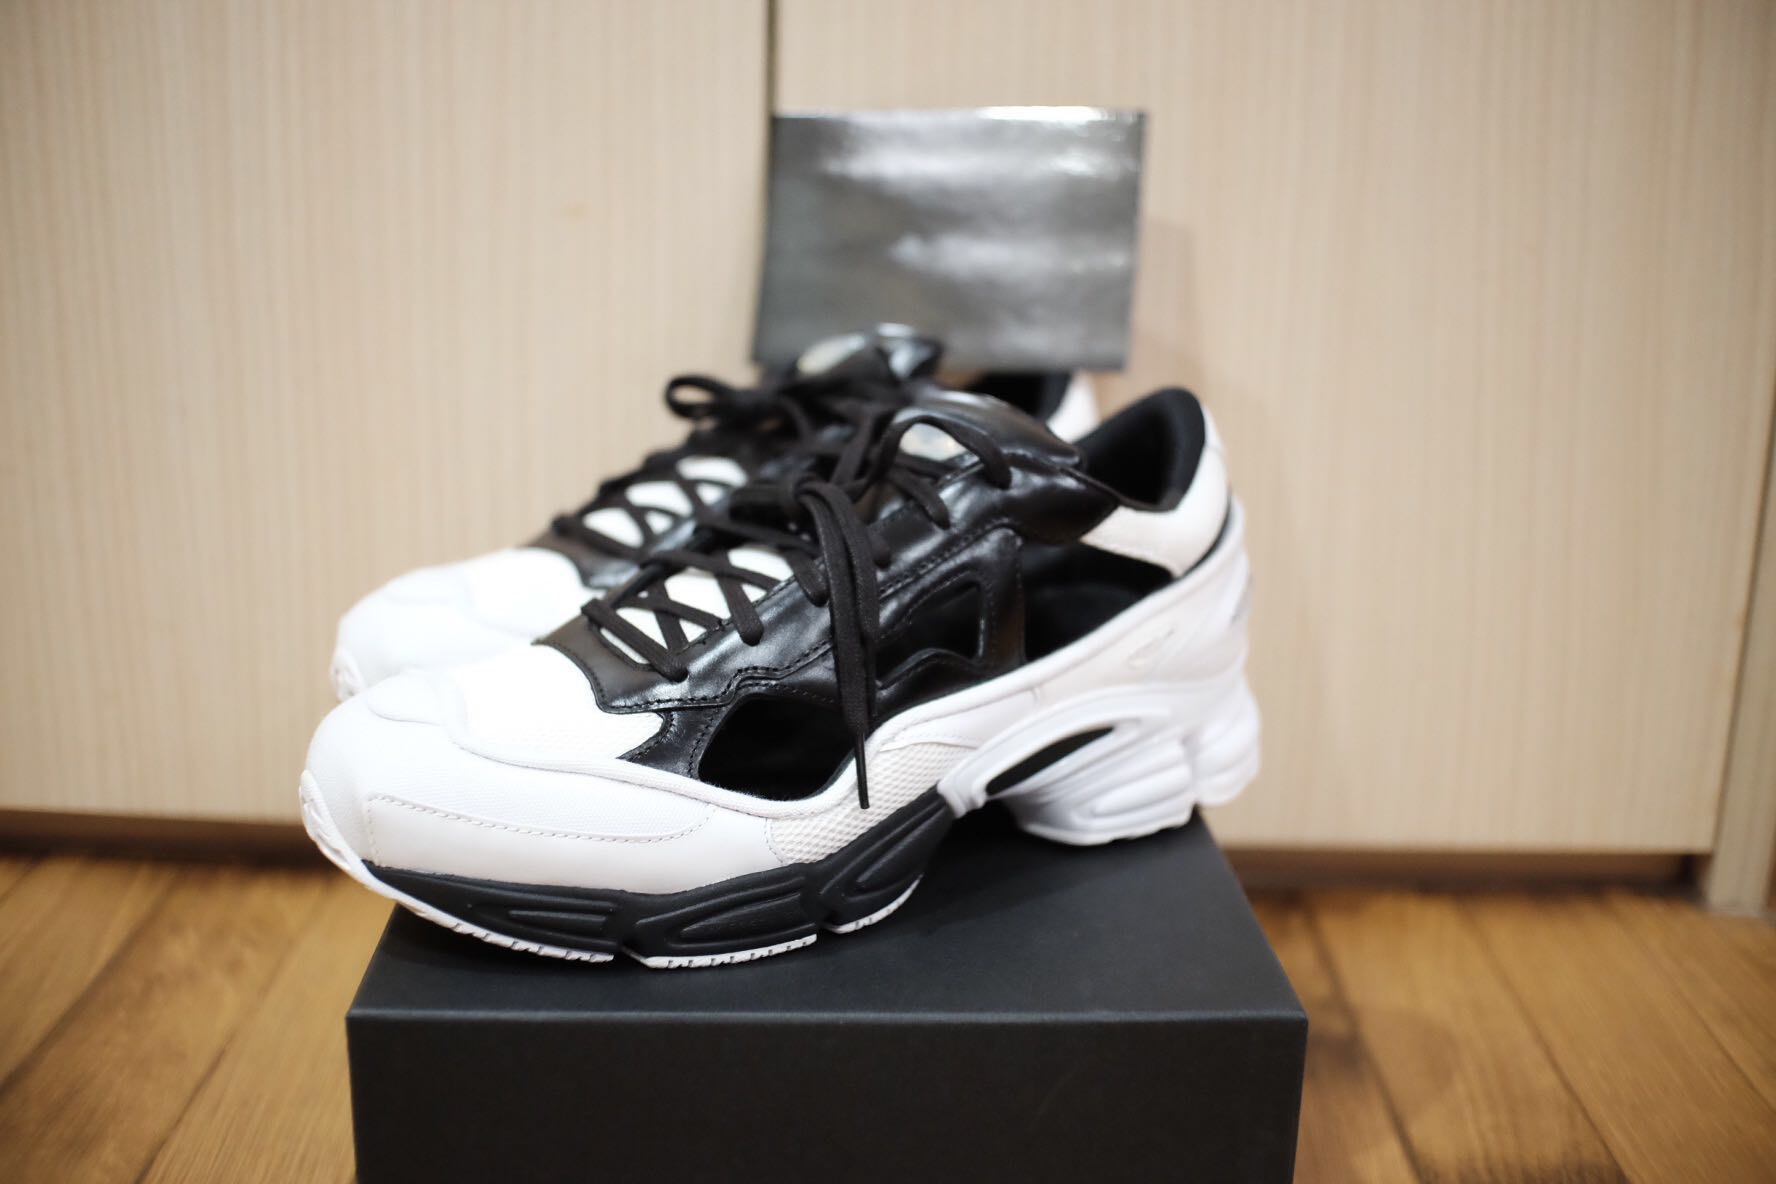 new product 3f36e 9ed06 Brand new Adidas raf simons RS replicant ozweego